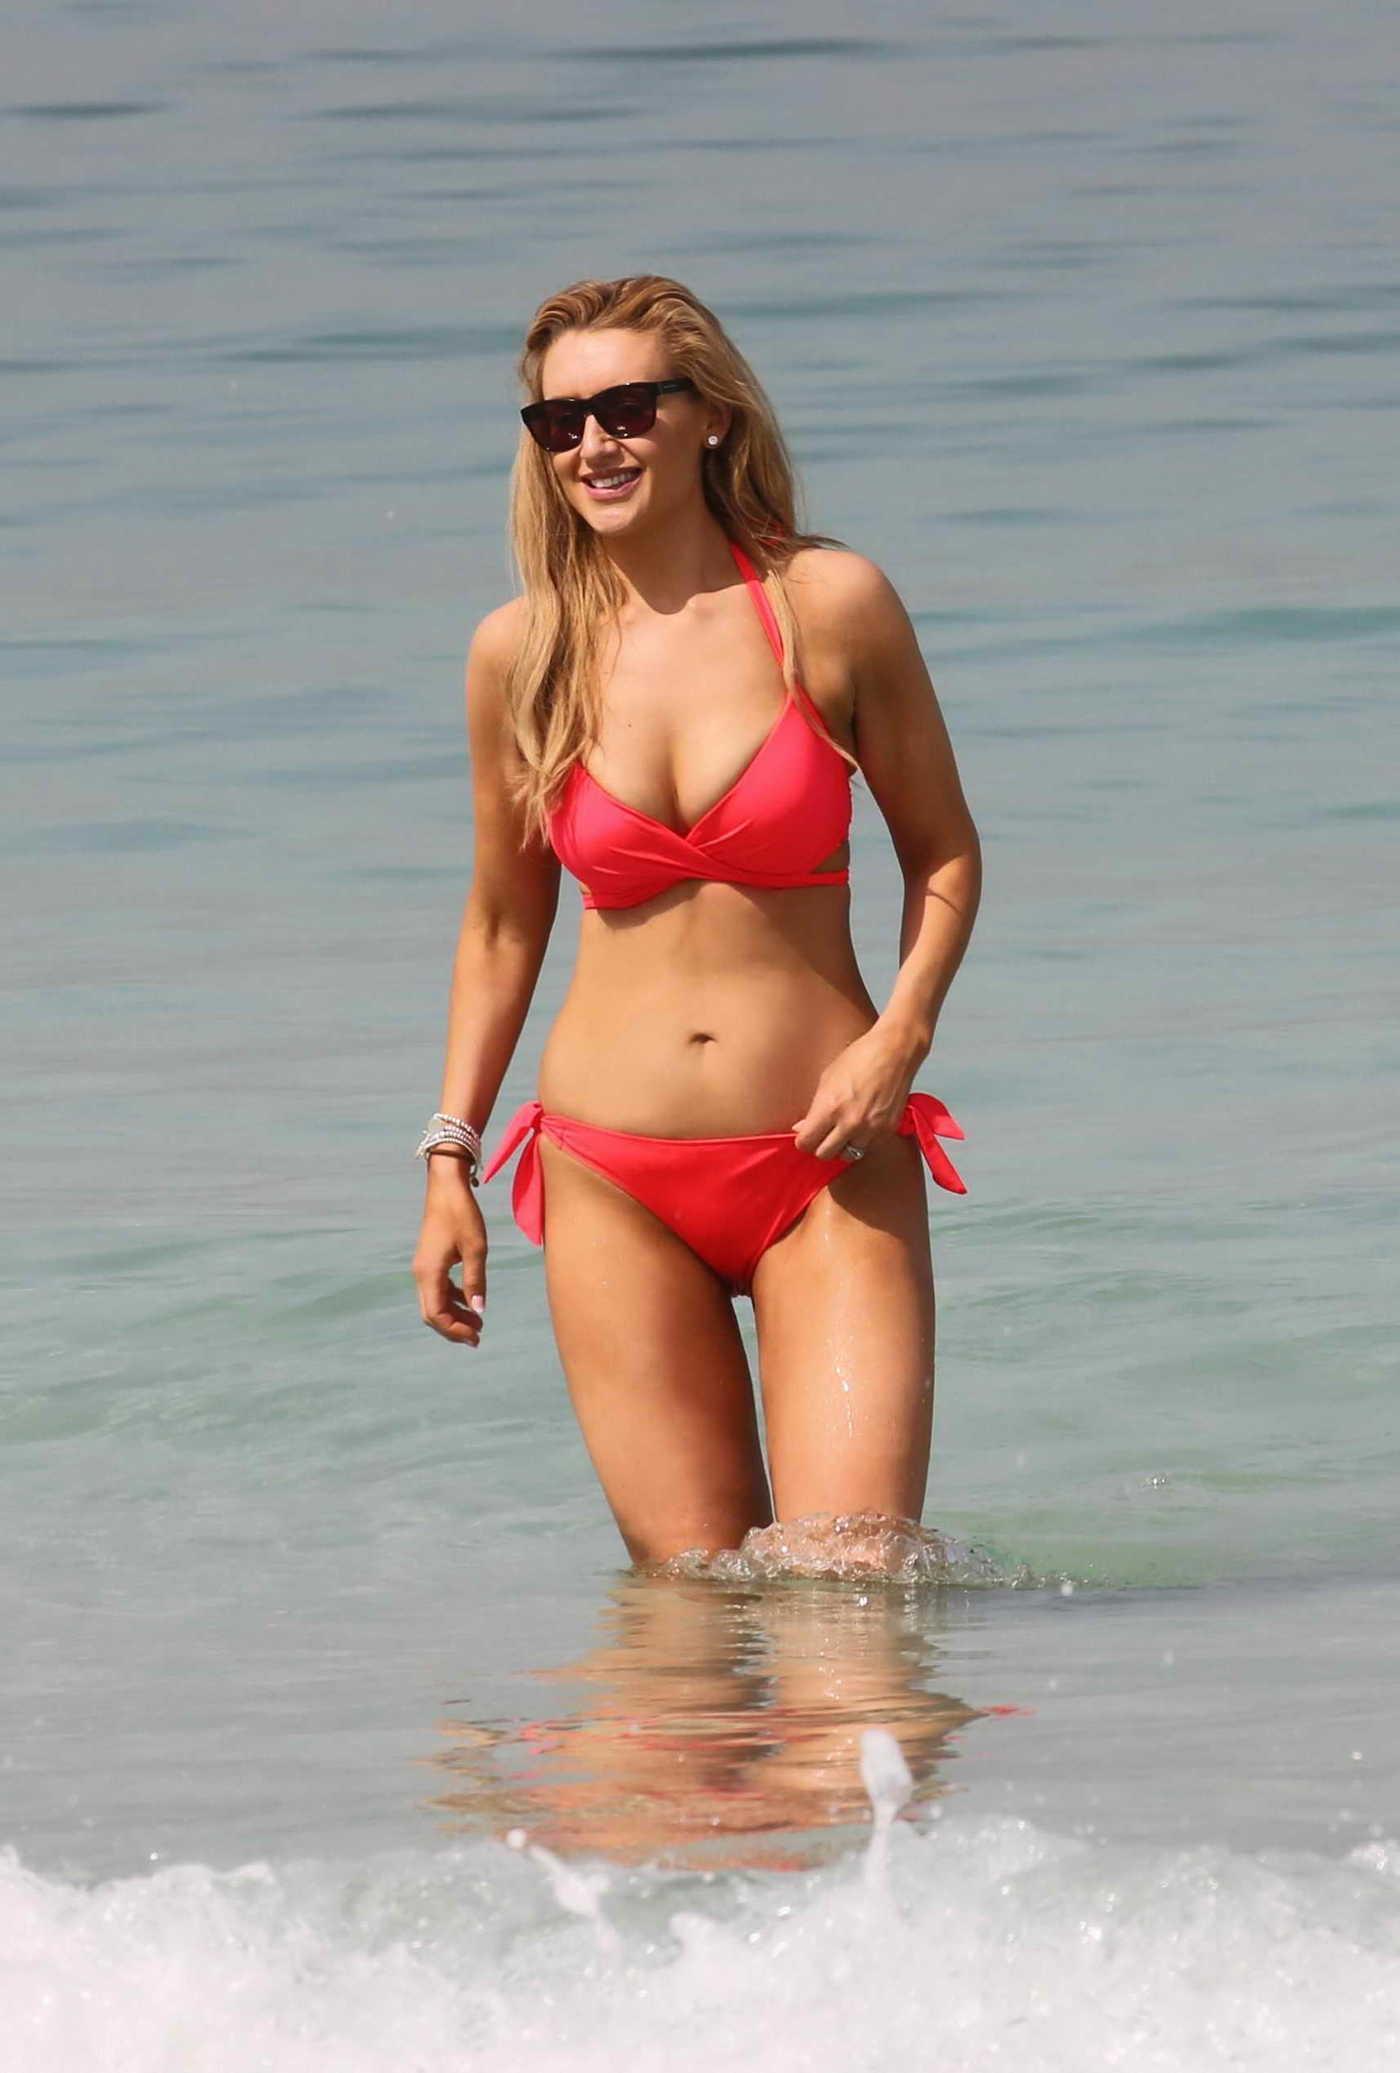 Catherine Tyldesley Wears a Red Bikini at the Beach in Dubai 03/28/2017